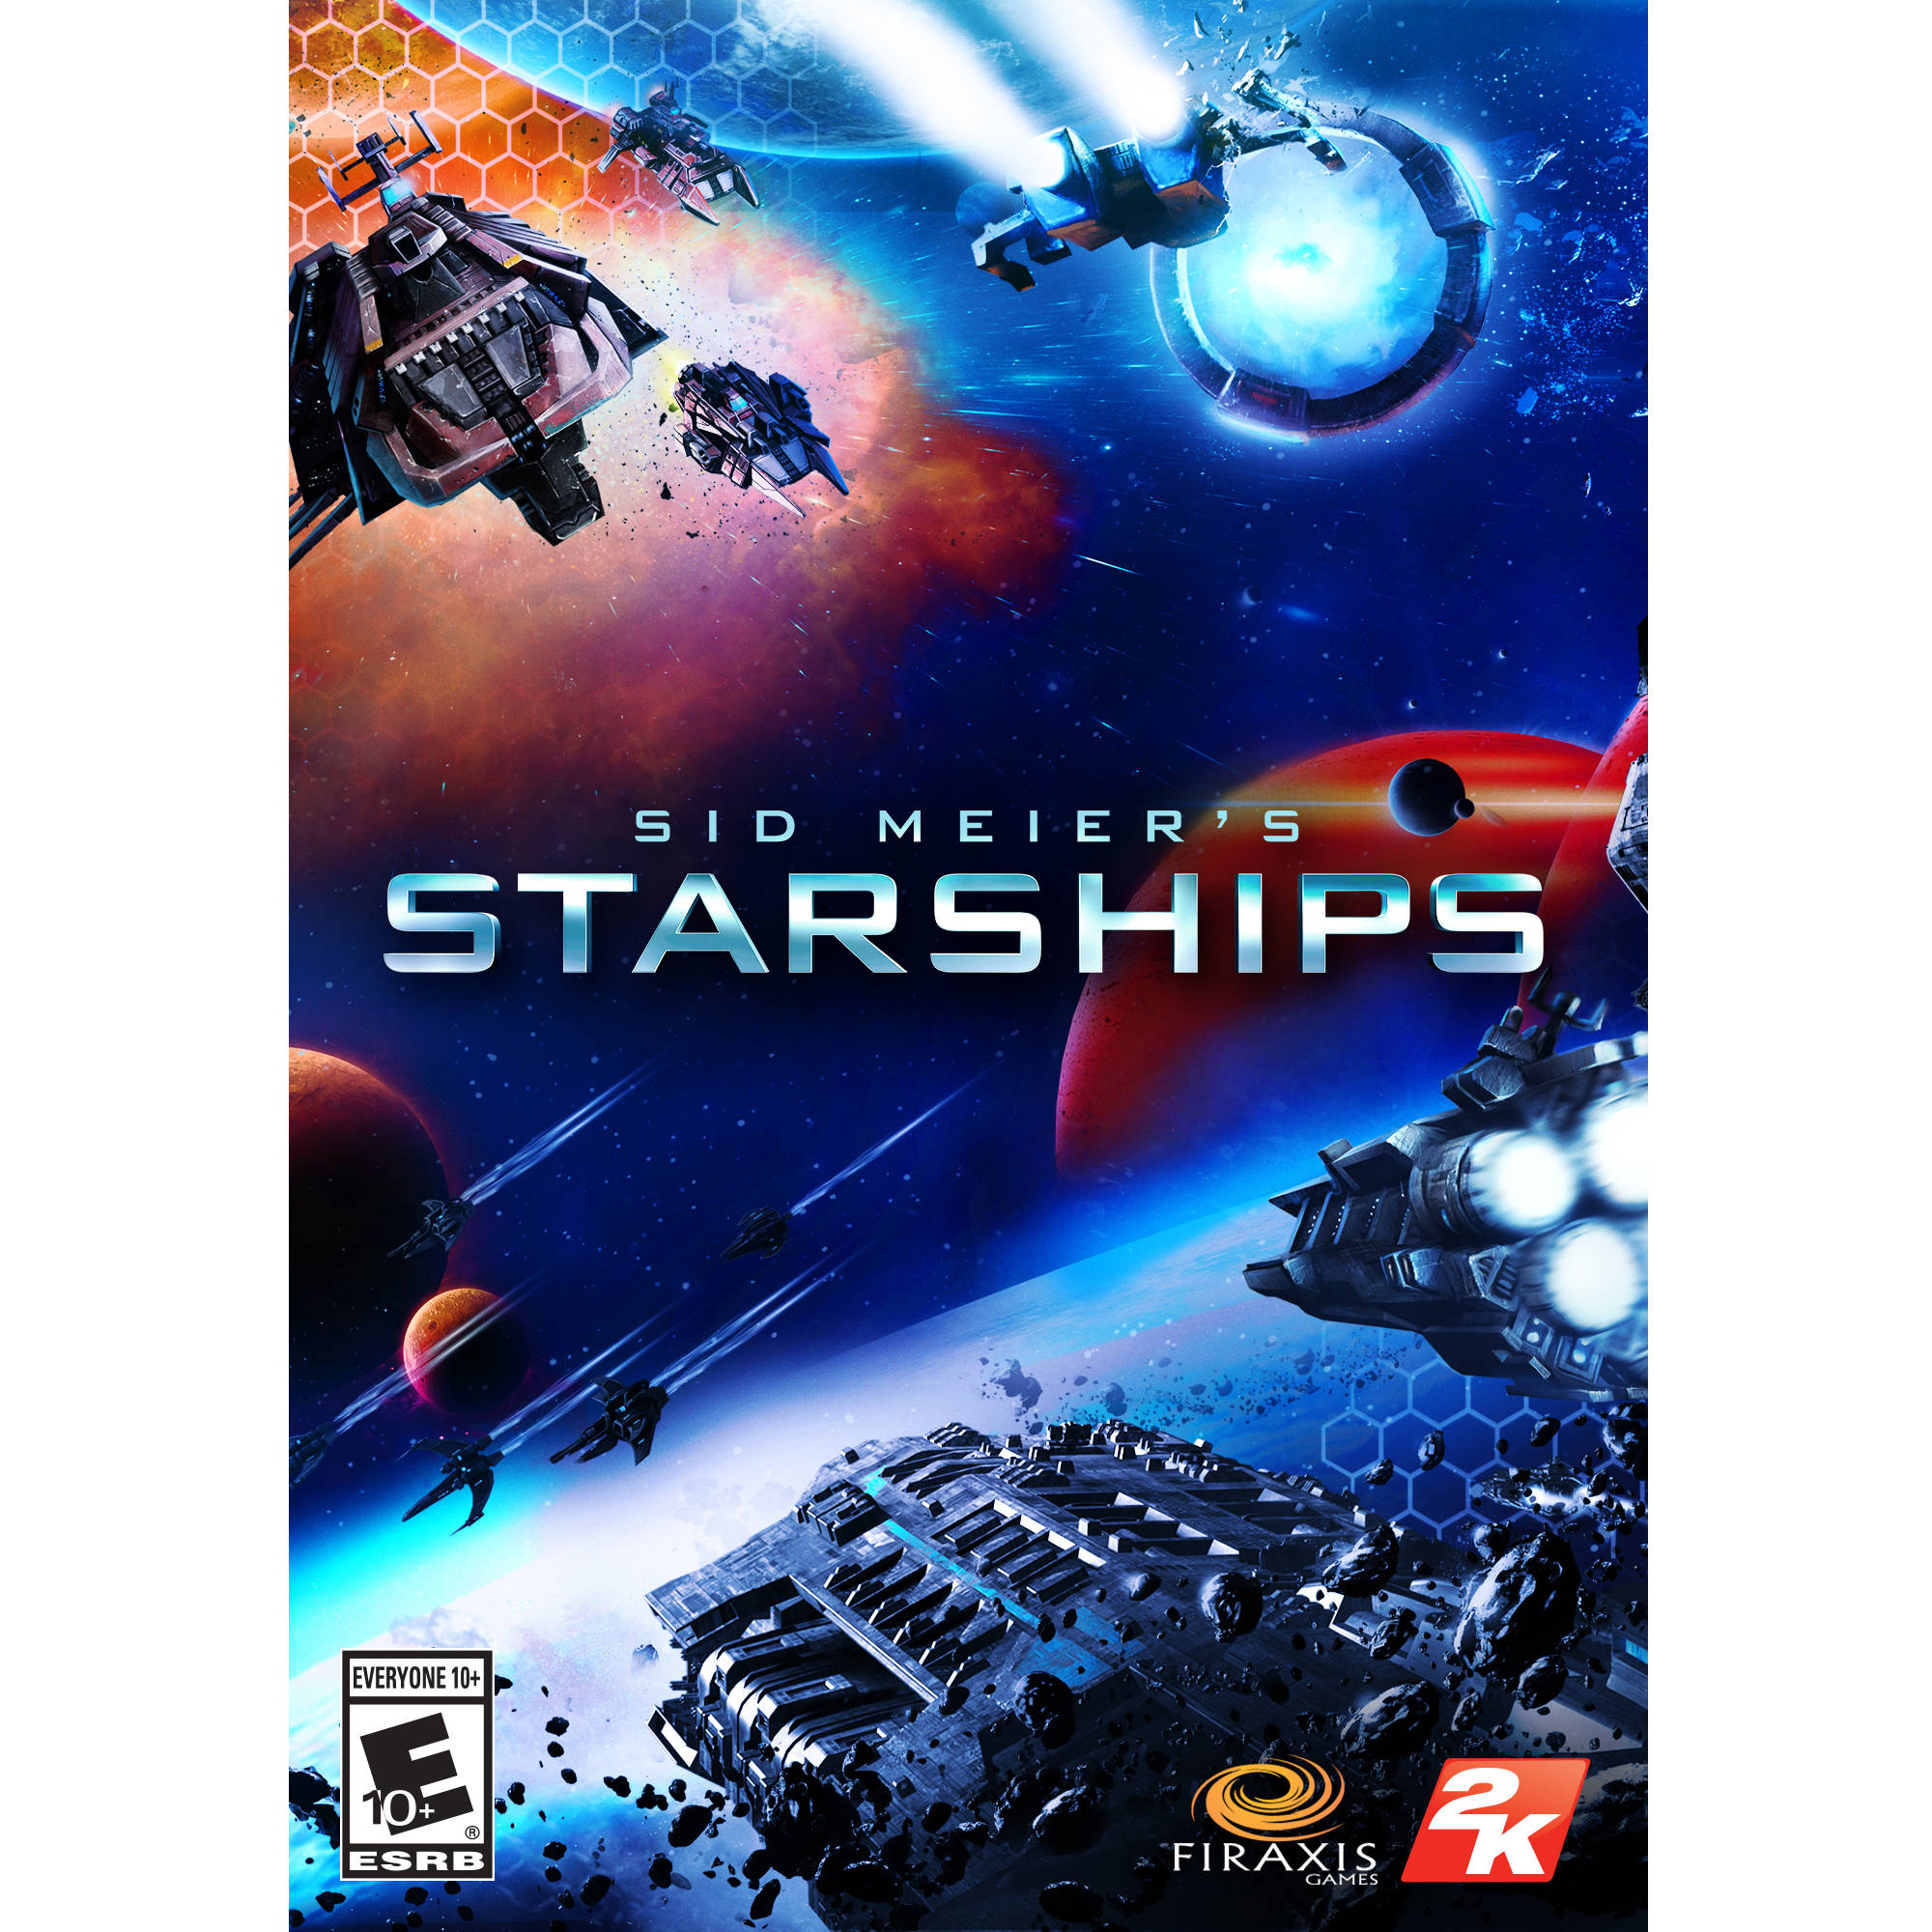 Sid Meier's Starships (PC) (Digital Download)